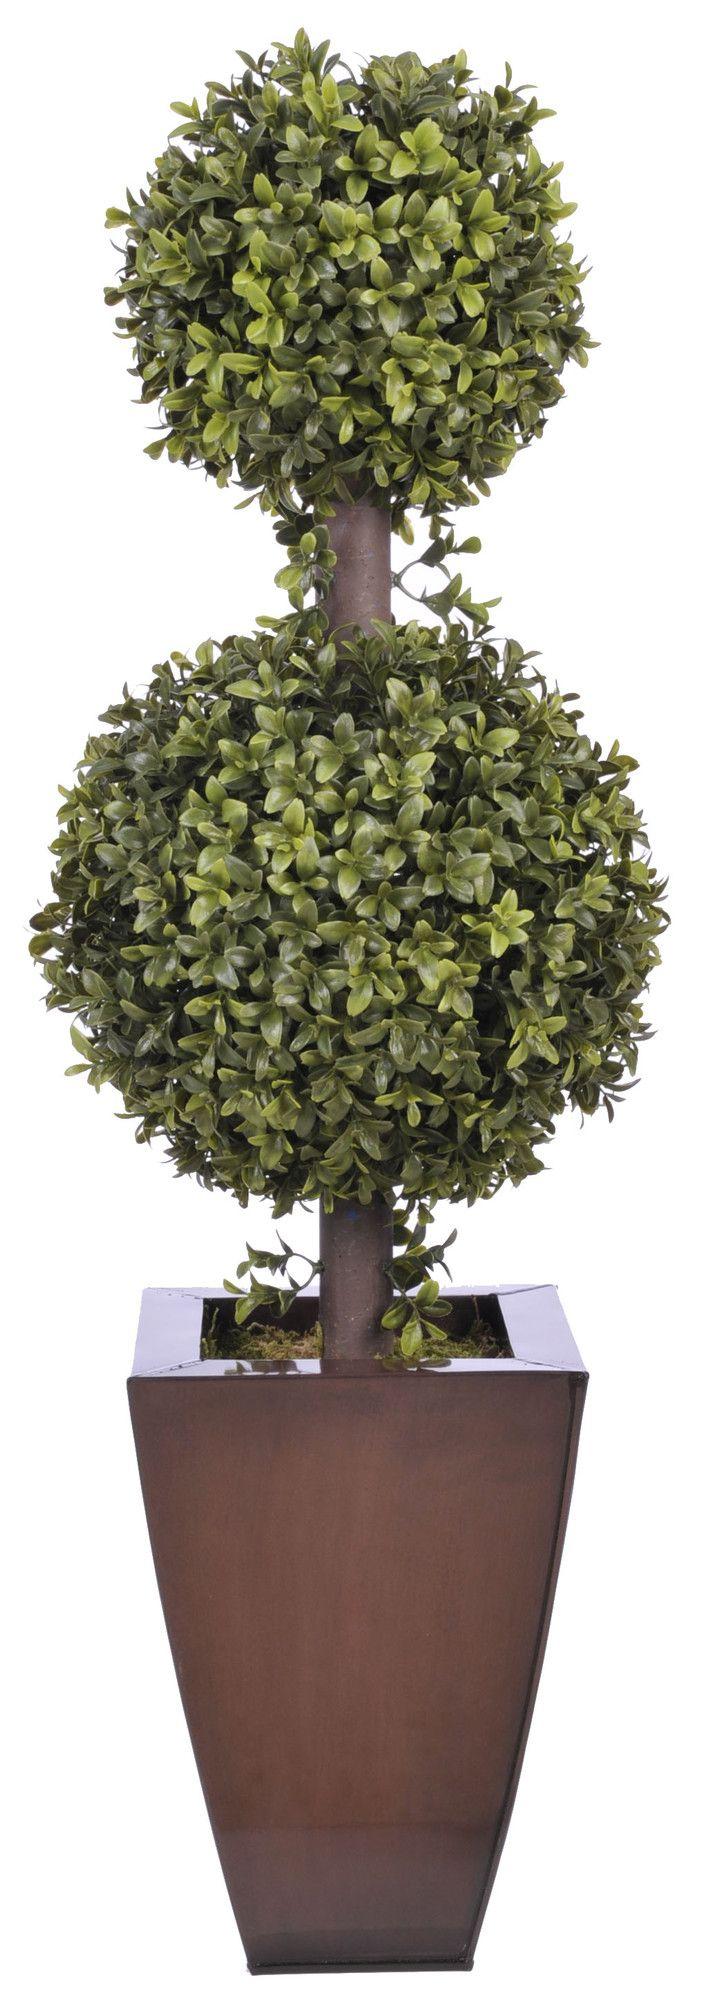 Artificial Double Ball Topiary In Pot Wayfair I Wish I